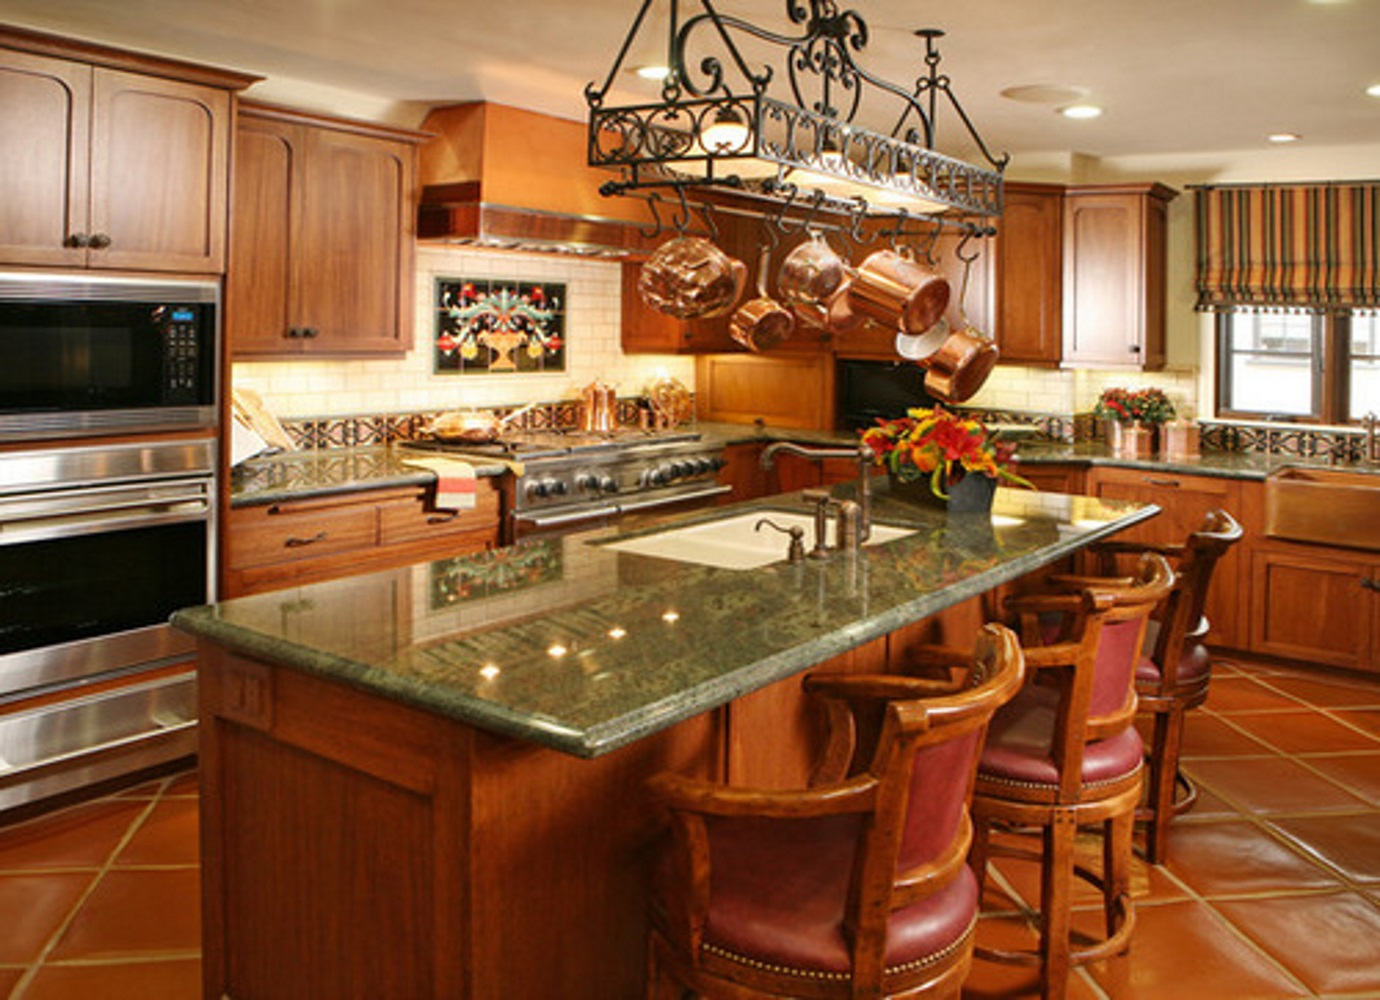 verde maritaka cozinha